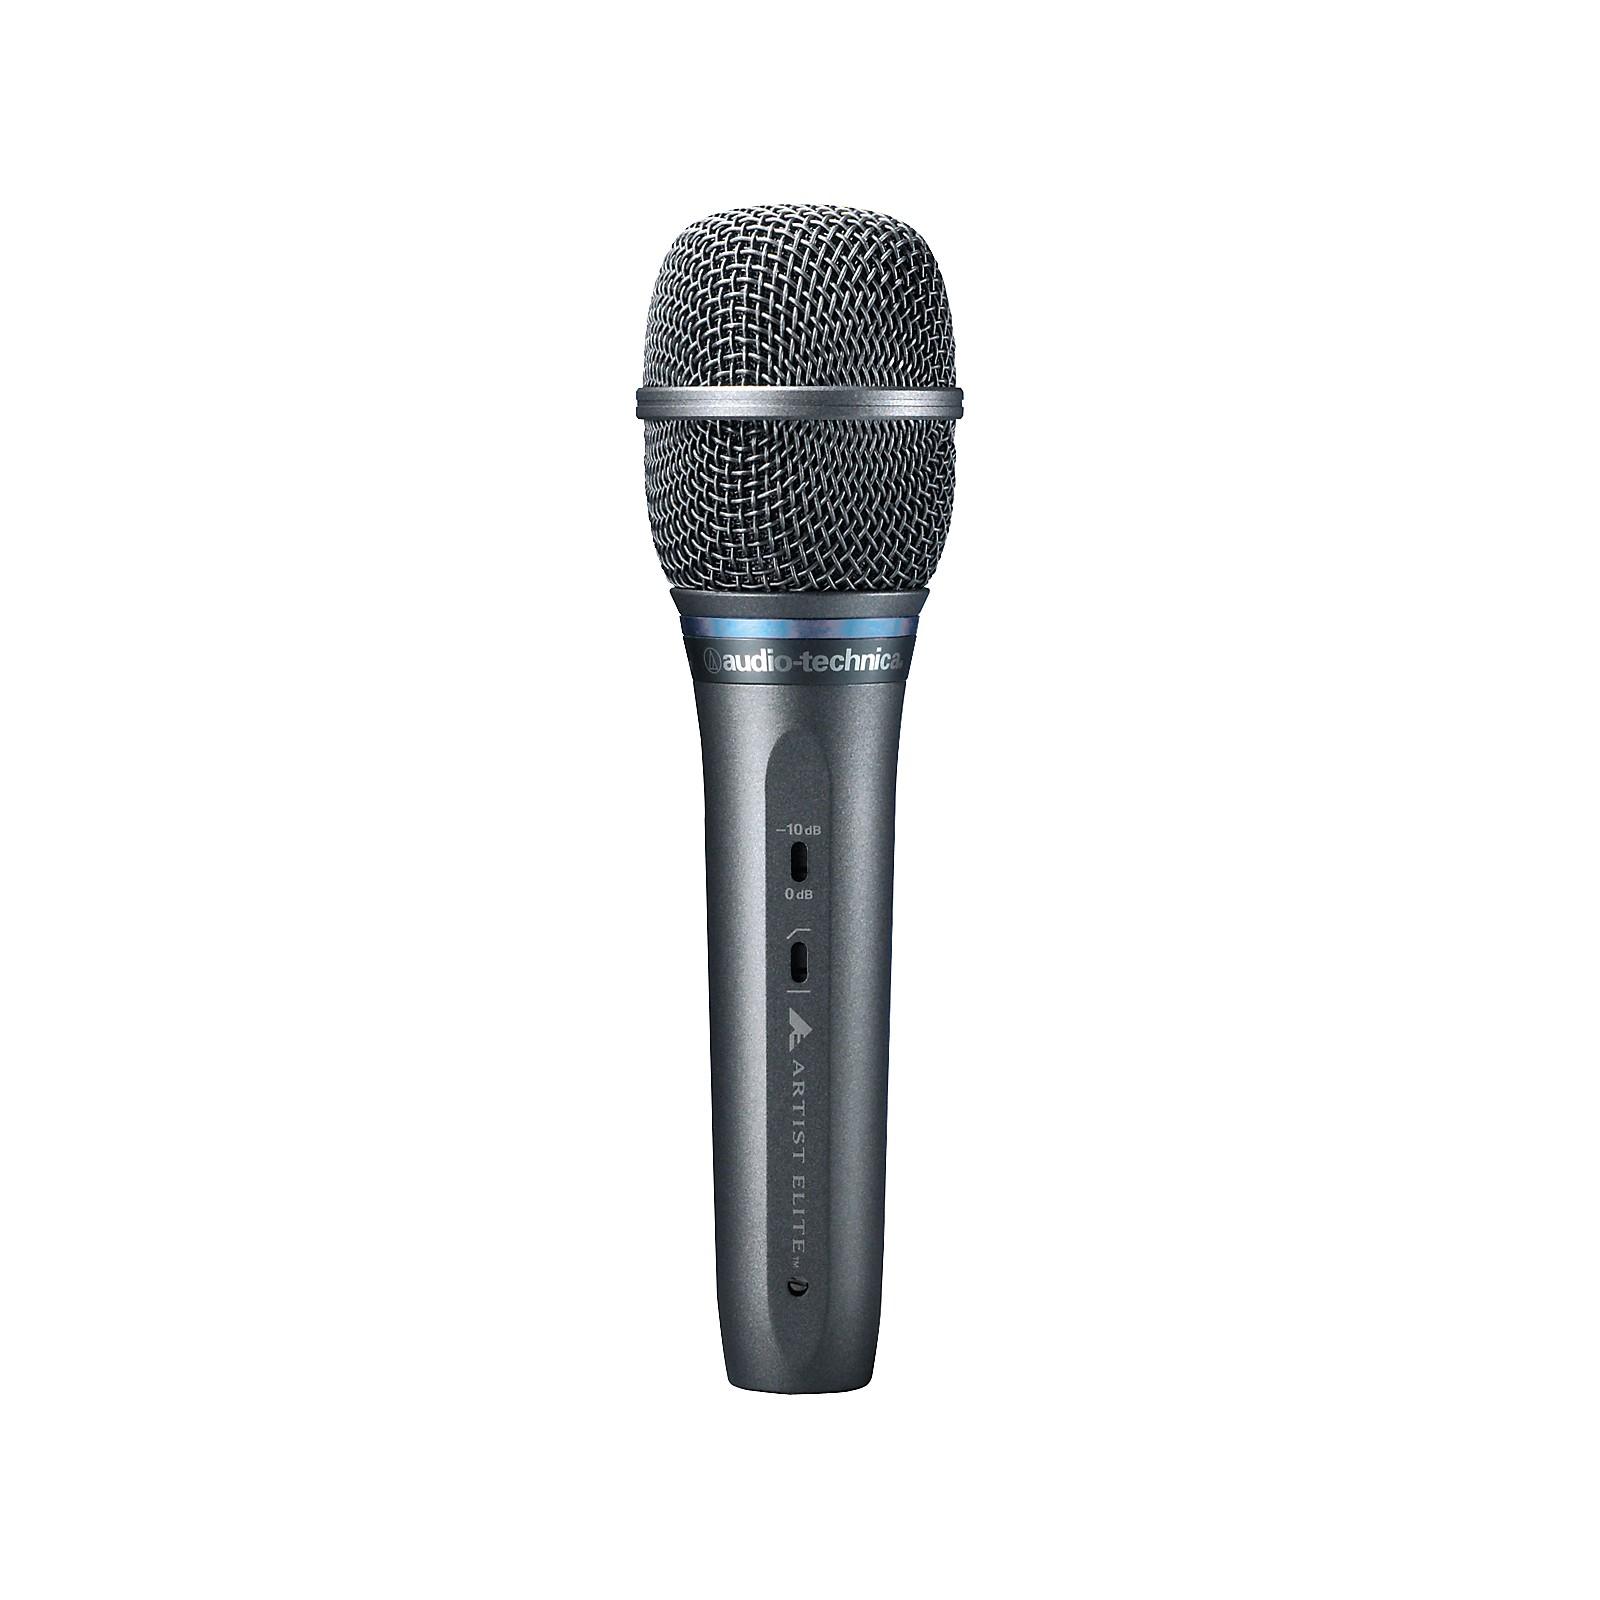 Audio-Technica AE5400 Cardioid Microphone